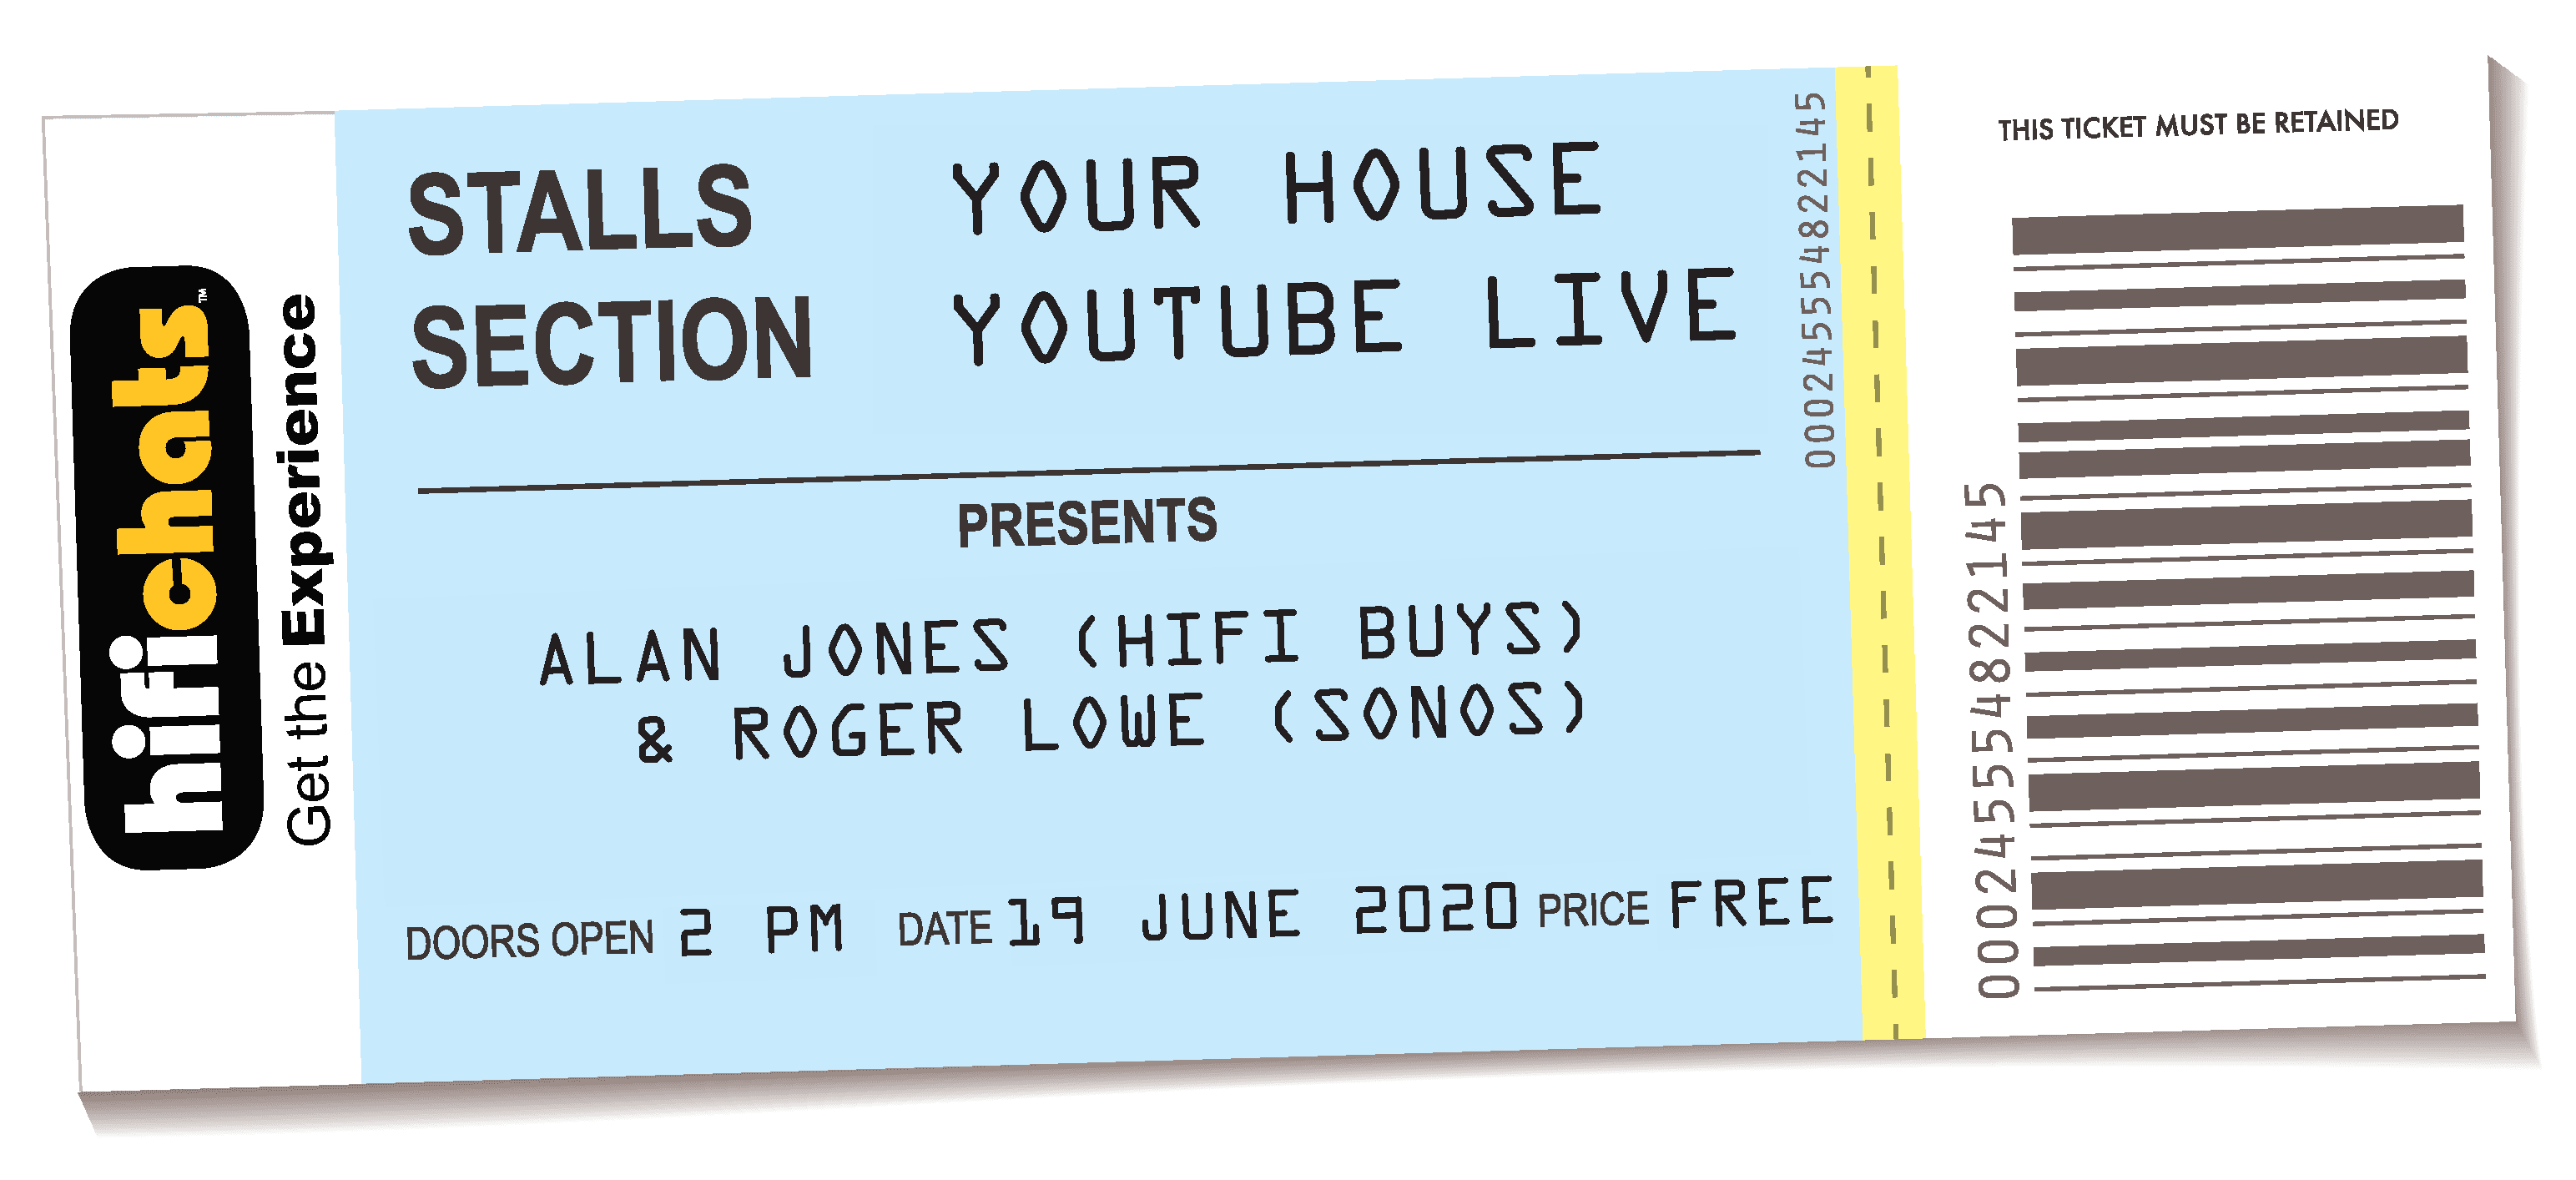 HFC Ticket Sonos cropped